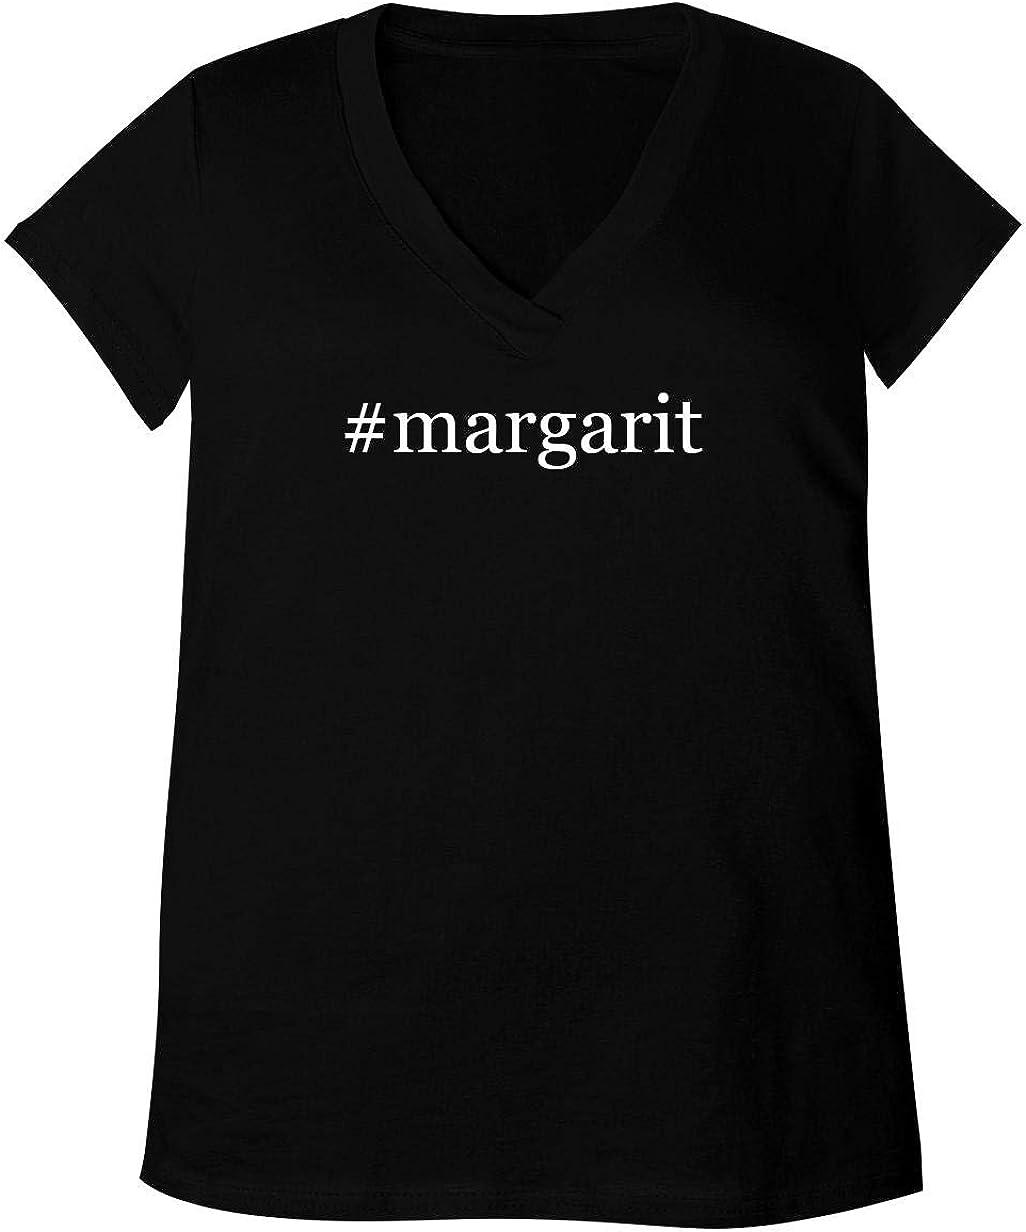 #Margarit - Adult Bella + Canvas B6035 Women's V-Neck T-Shirt 51XqPsKRRuL